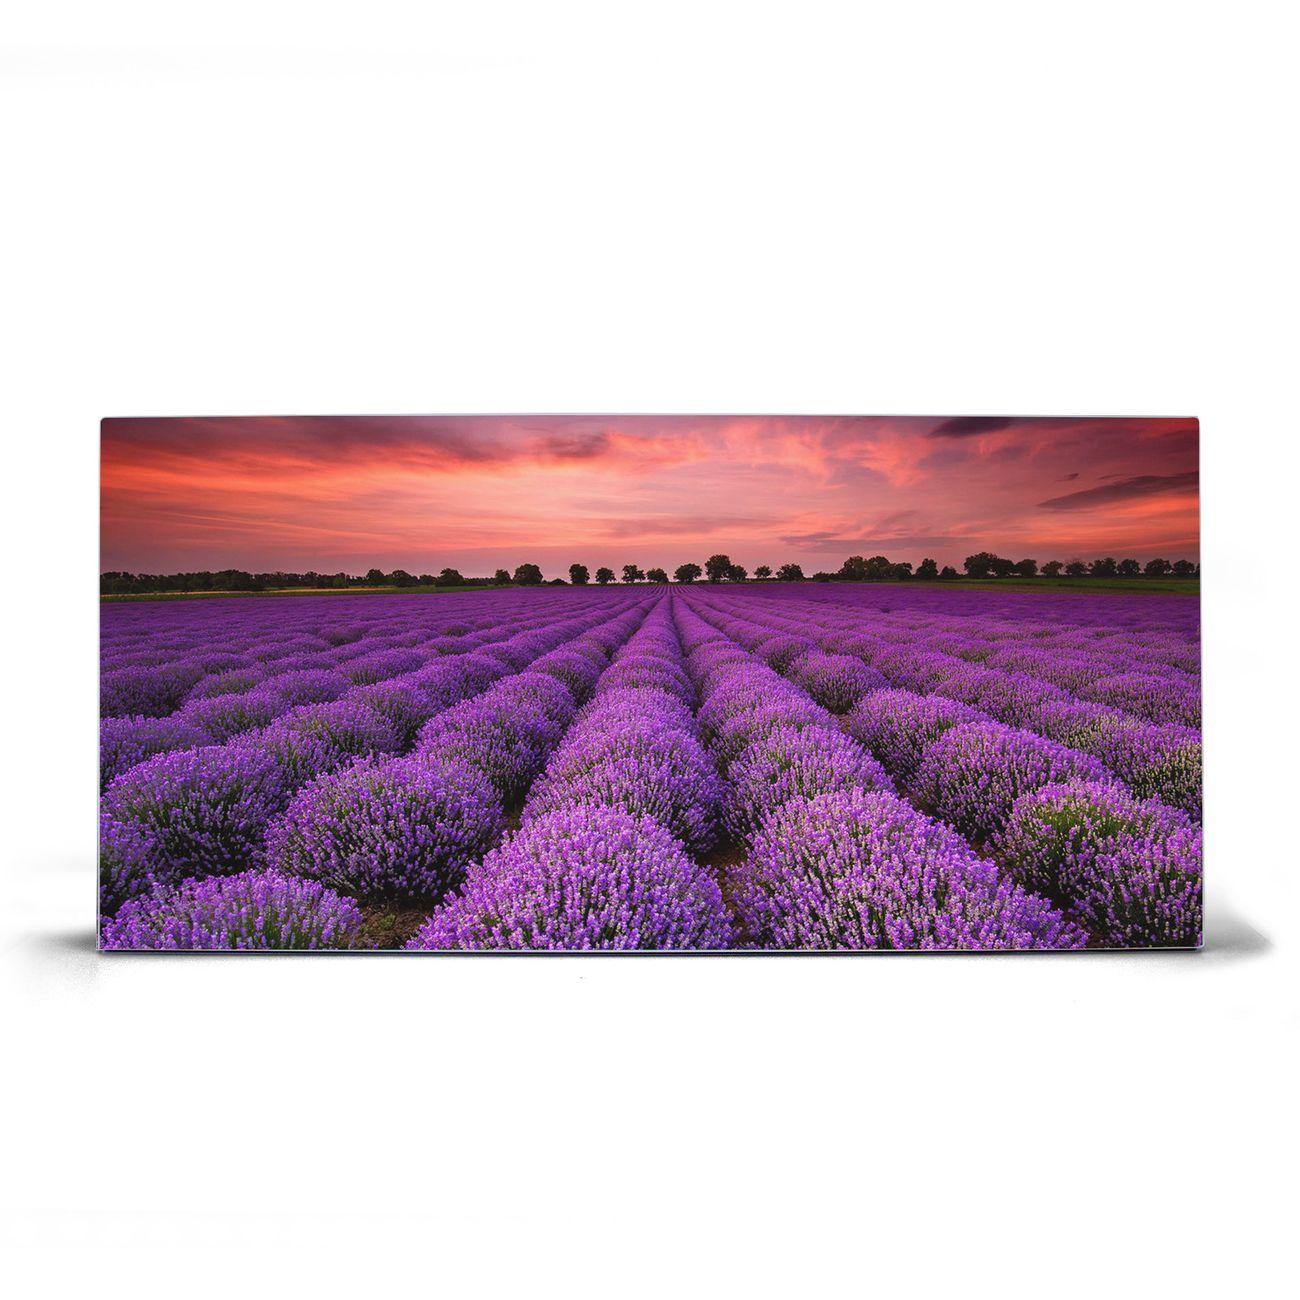 Magnettafel silber Querformat Lavendelfeld